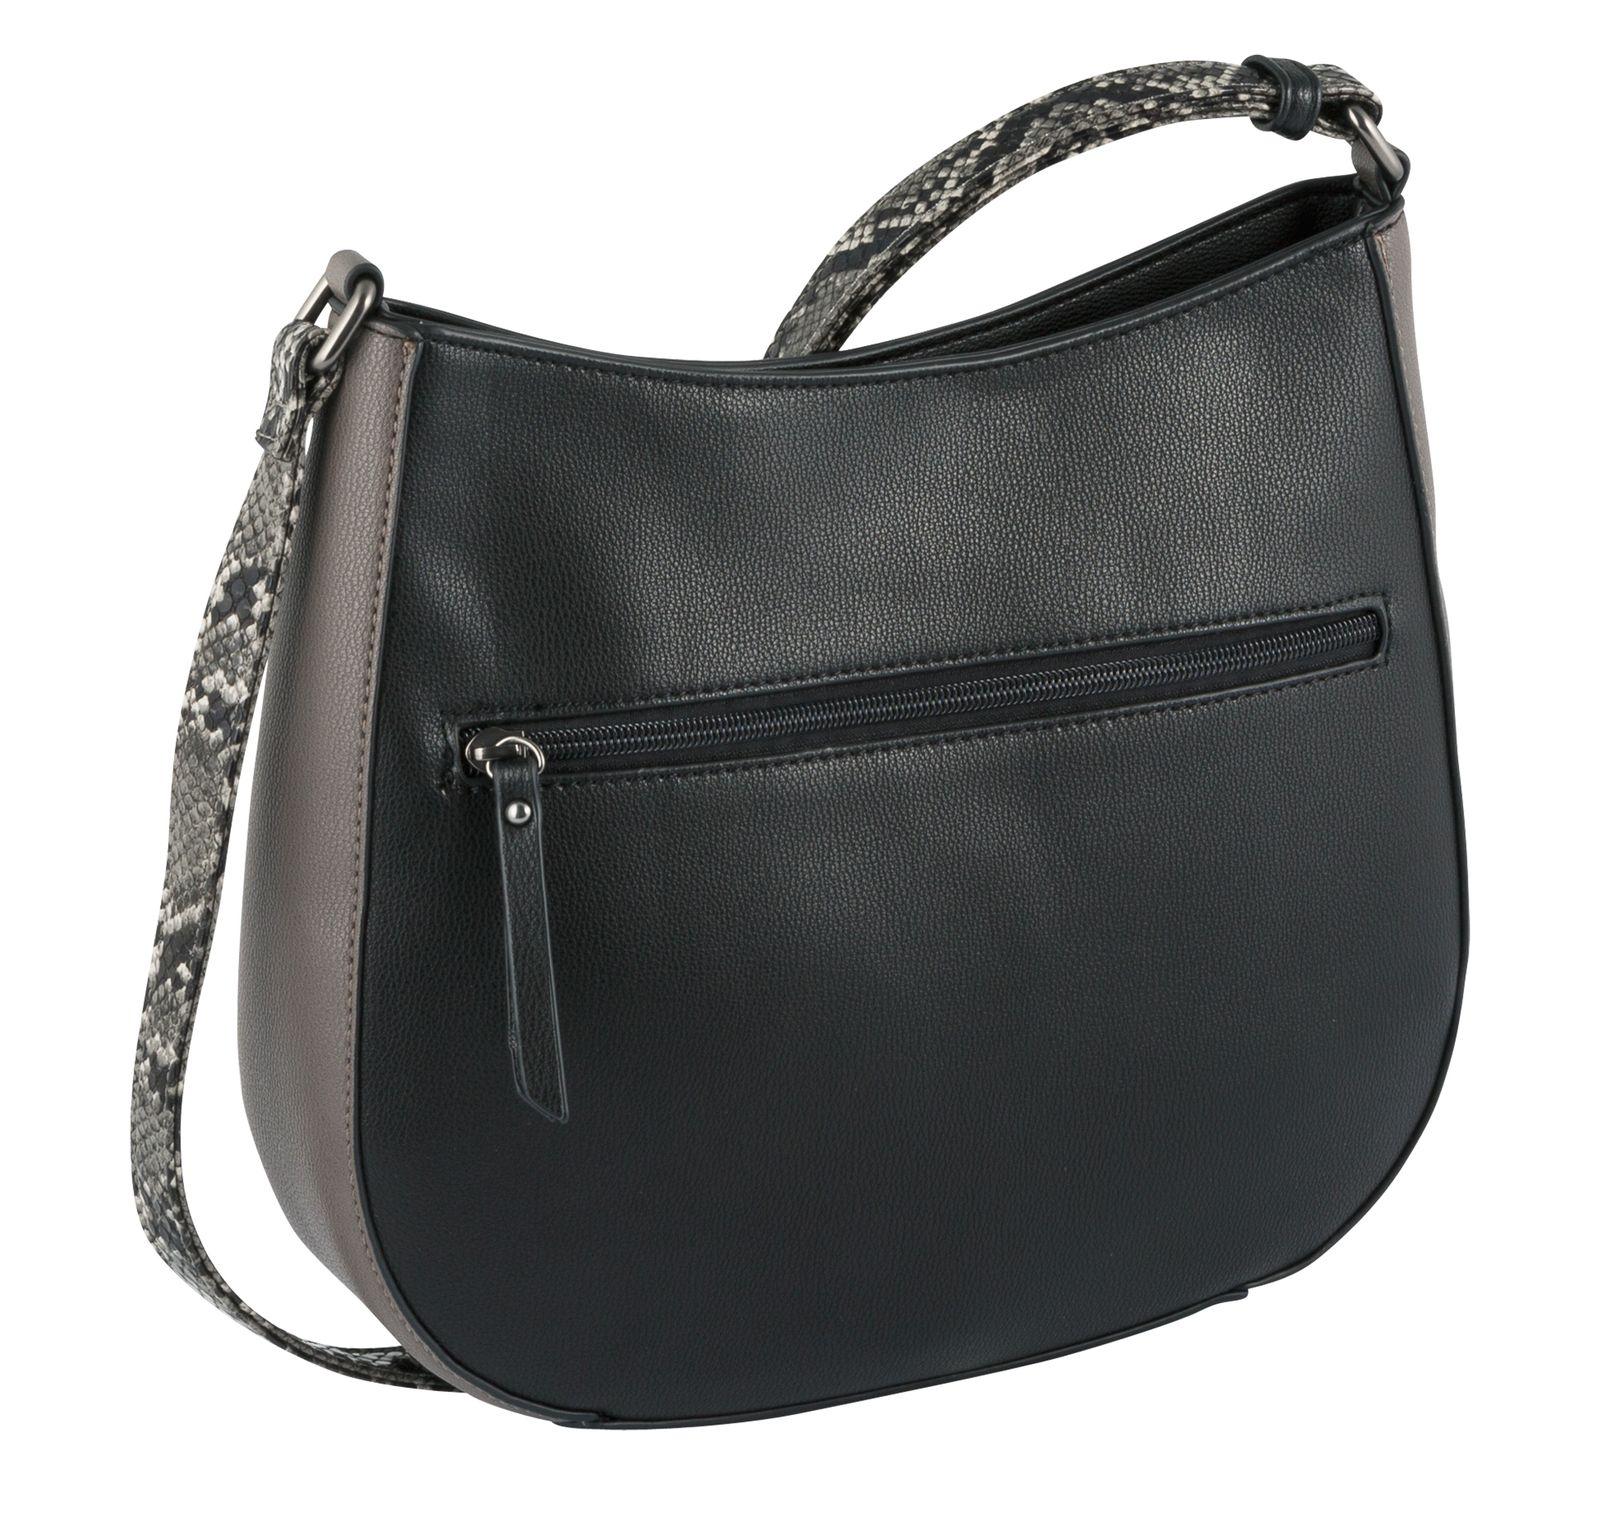 Gabor Janna Hobo Bag Mixed Black